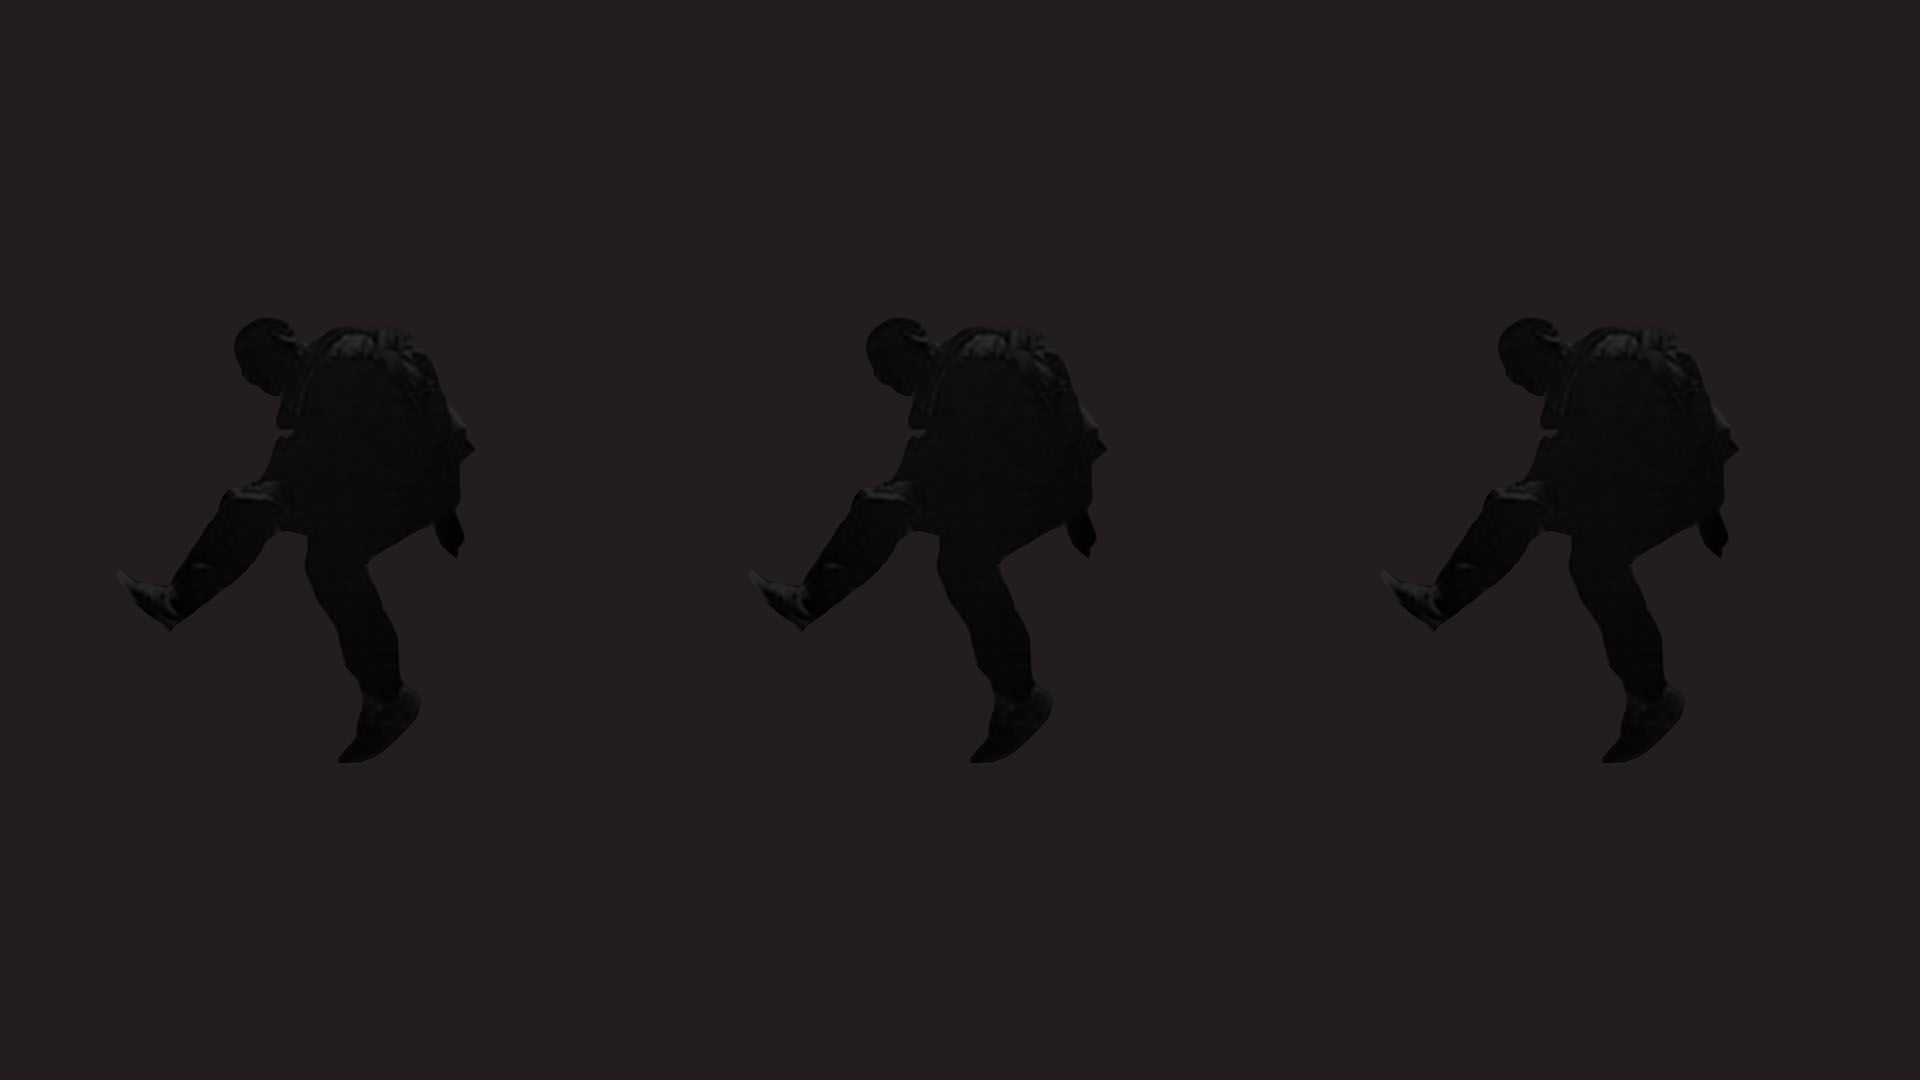 [1920x1080] [Kanye West] Simple dark desktop wallpaper Need #iPhone #6S #Plus #Wallpaper/ #Background for #IPhone6SPlus? Follow iPhone 6S Plus 3Wallpapers/ ...